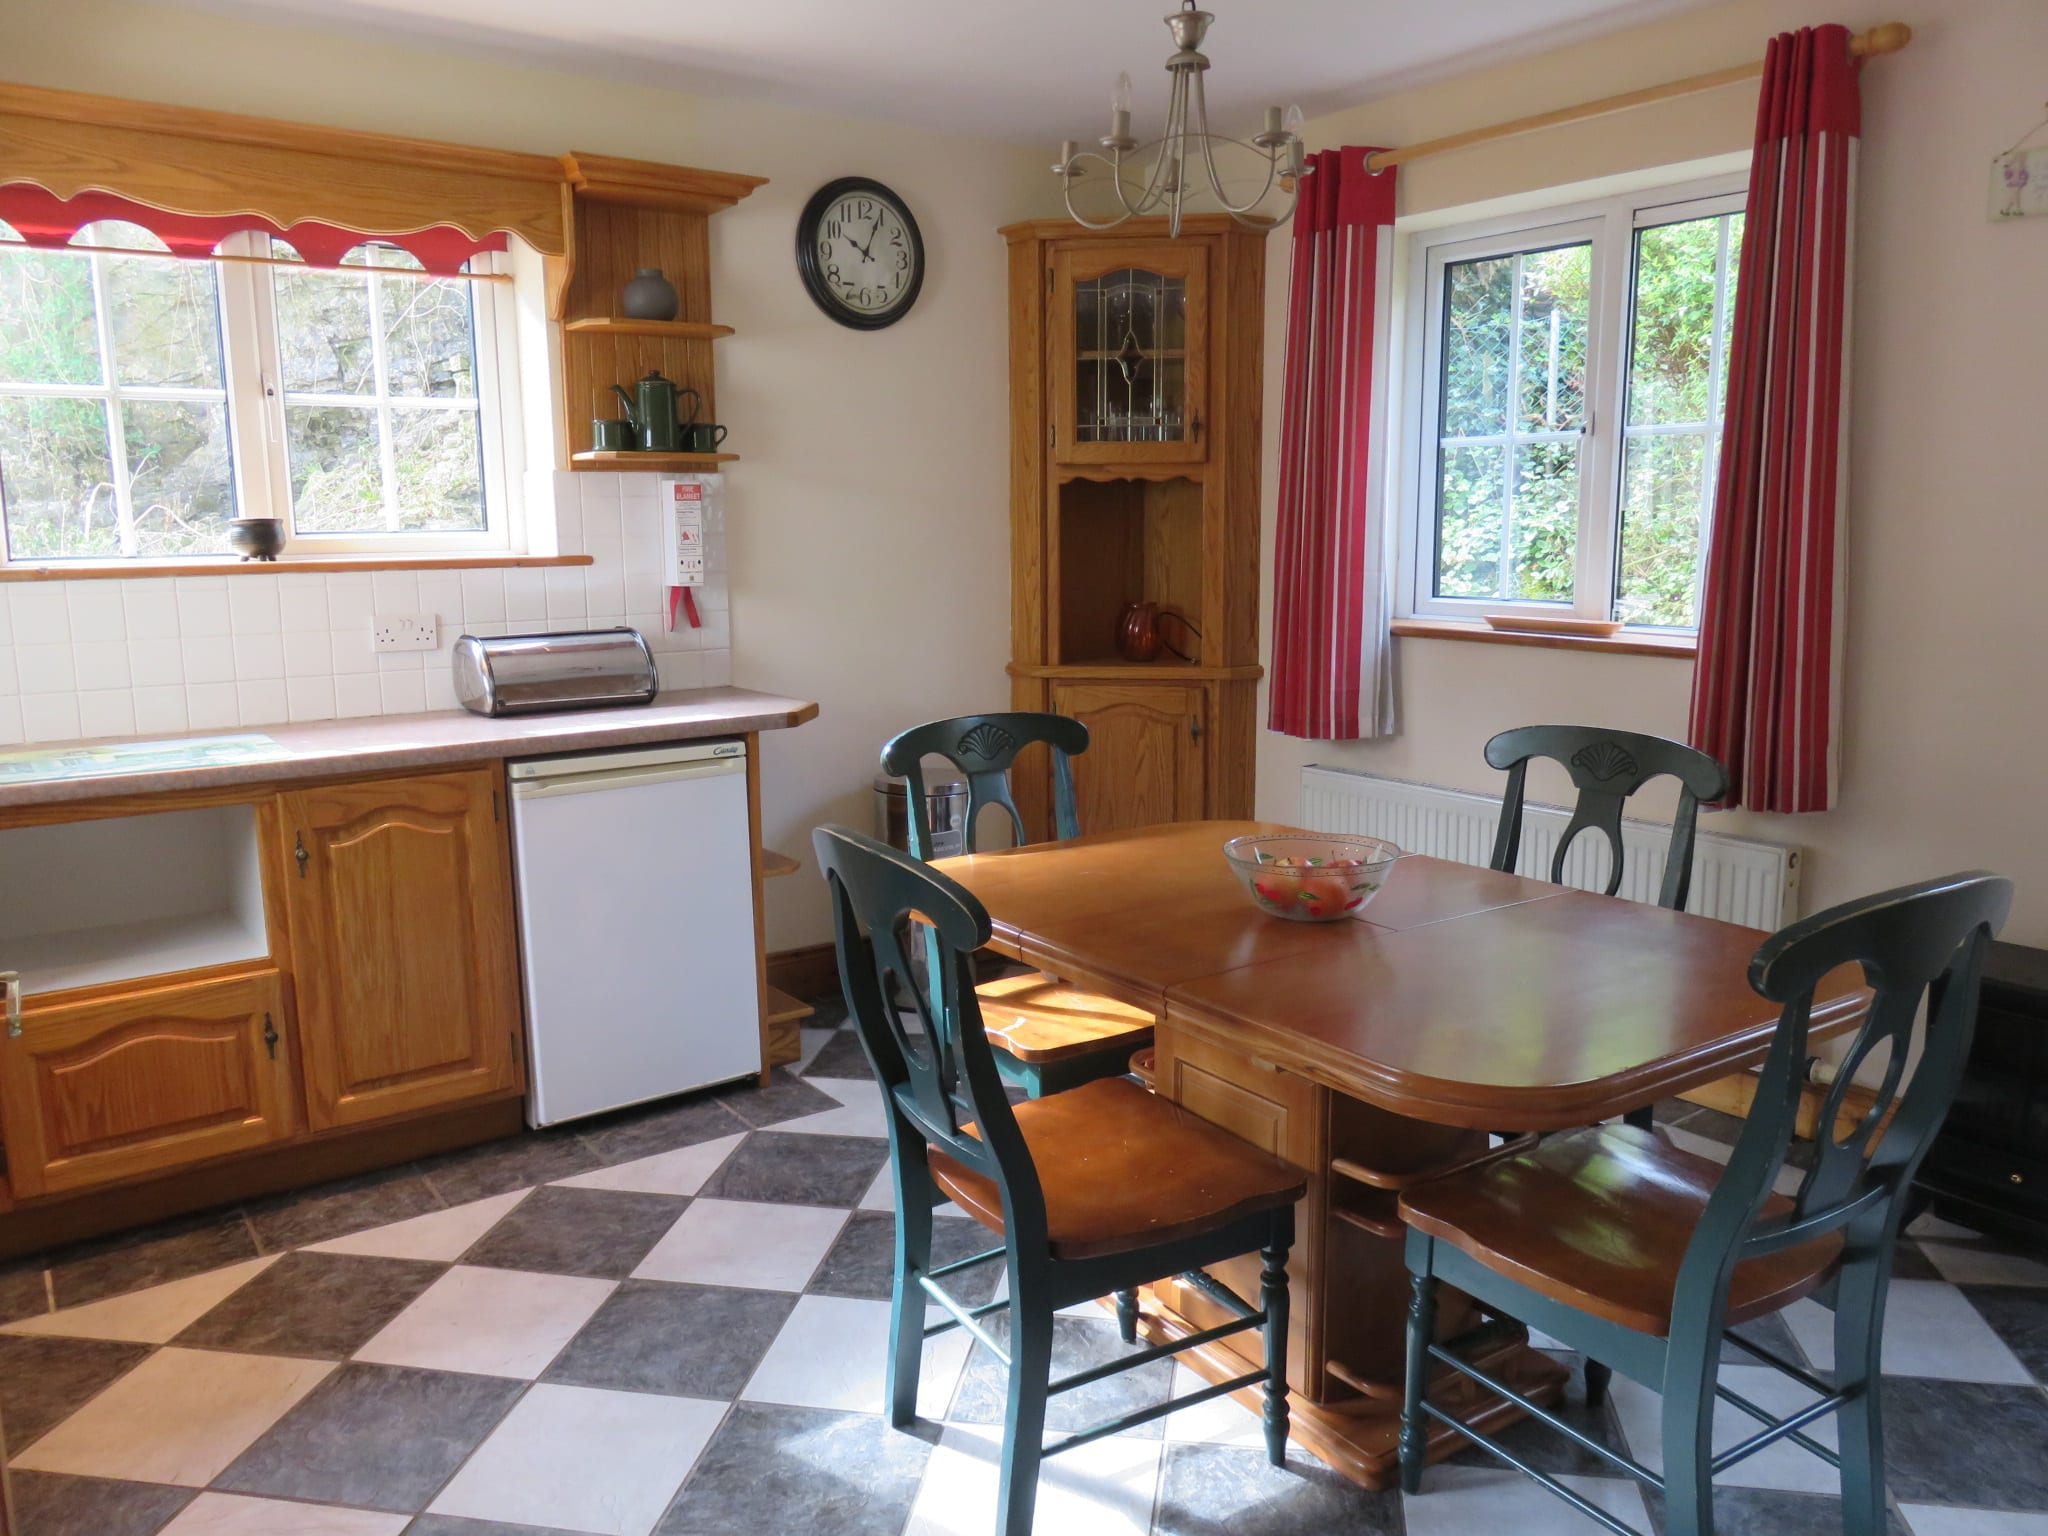 7. Kitchen side IMG_5876